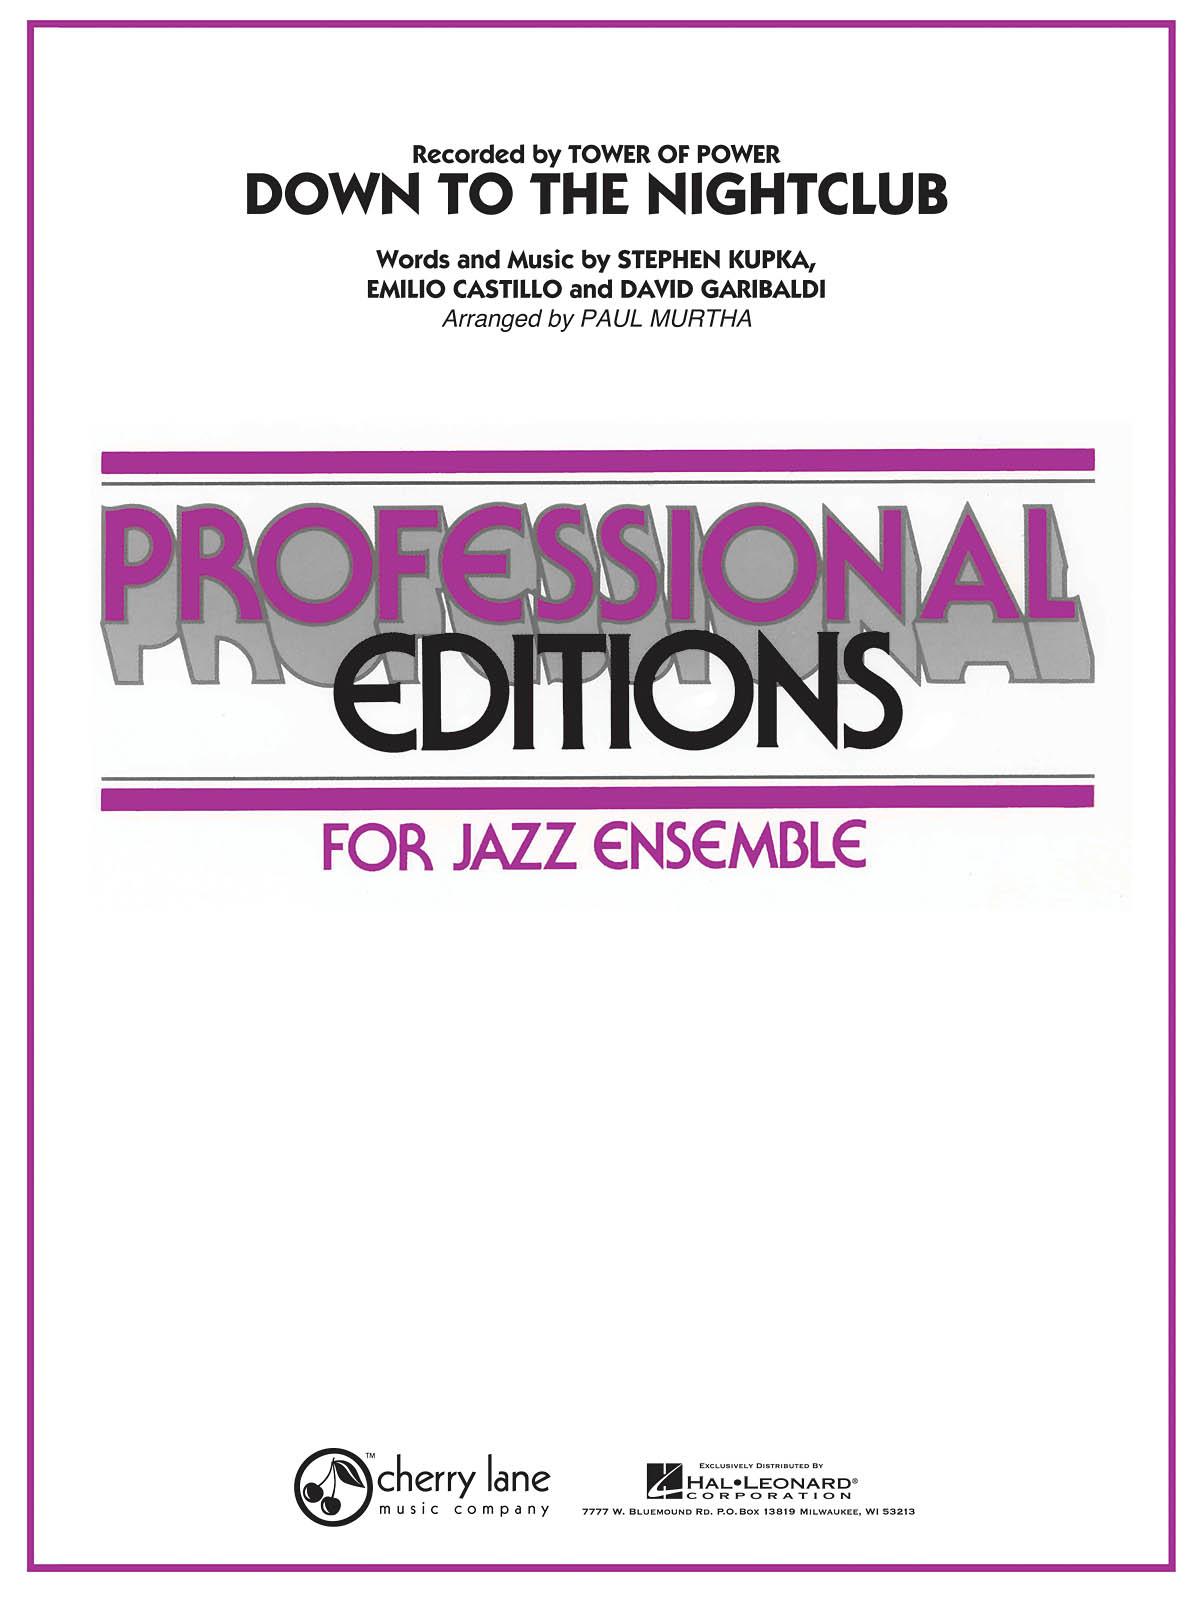 David Garibaldi Emilio Castillo Stephen Kupka: Down to the Nightclub: Jazz